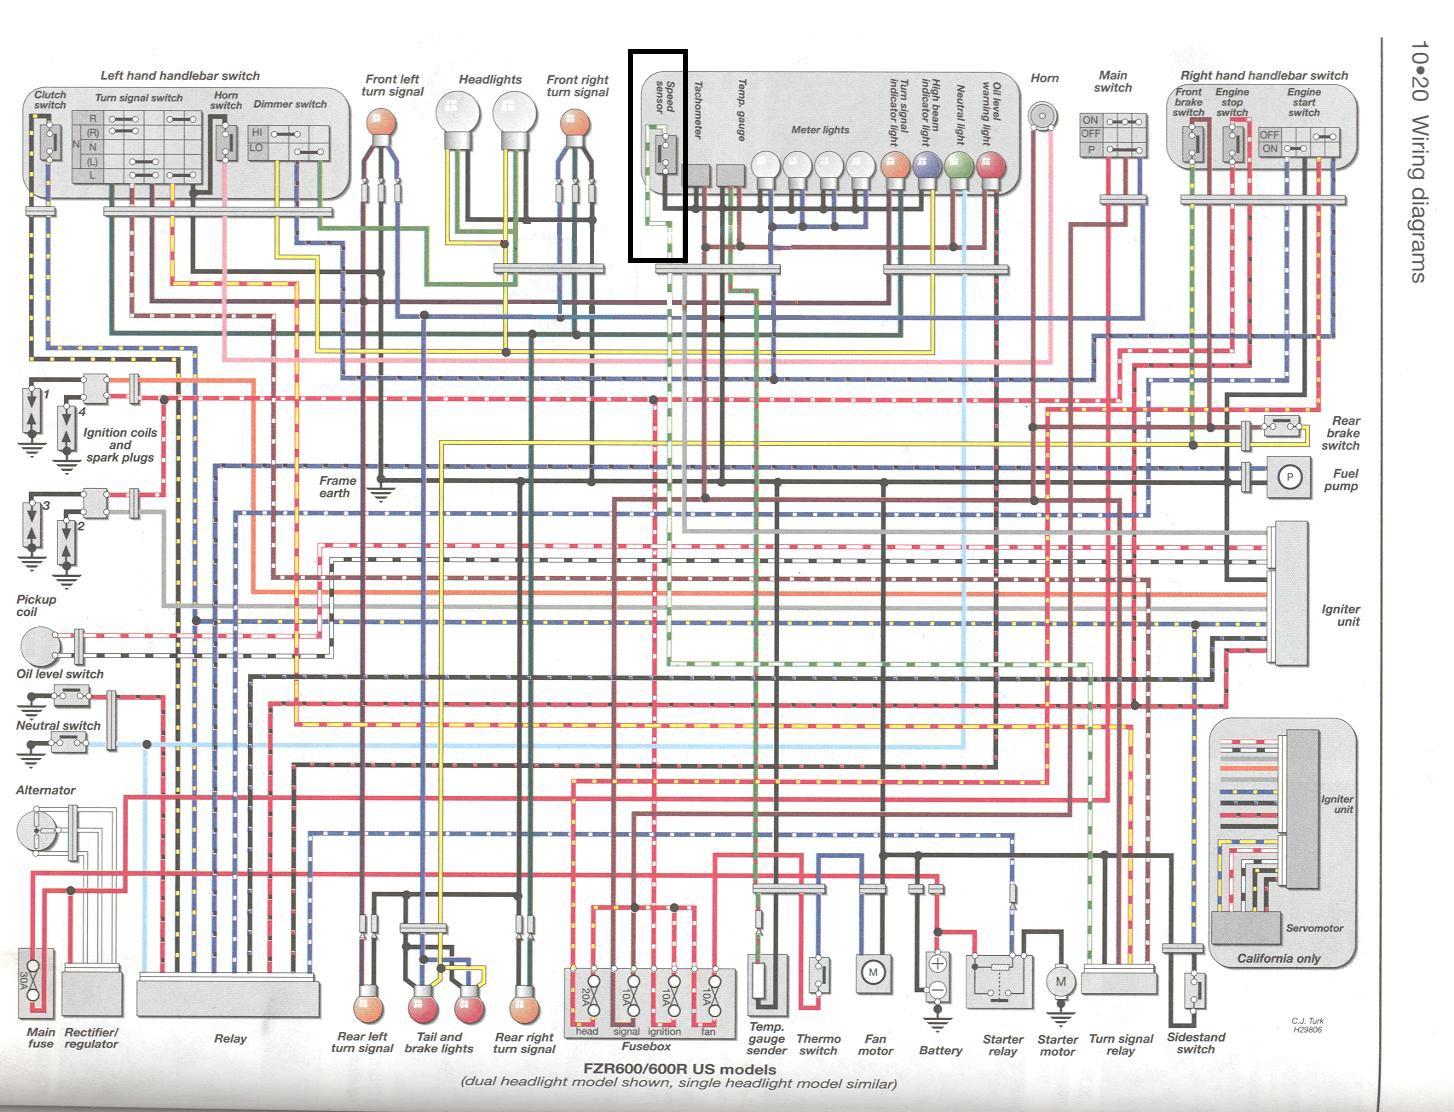 yzf 600 wiring diagram trusted schematics wiring diagrams u2022 rh bestbooksrichtreasures com